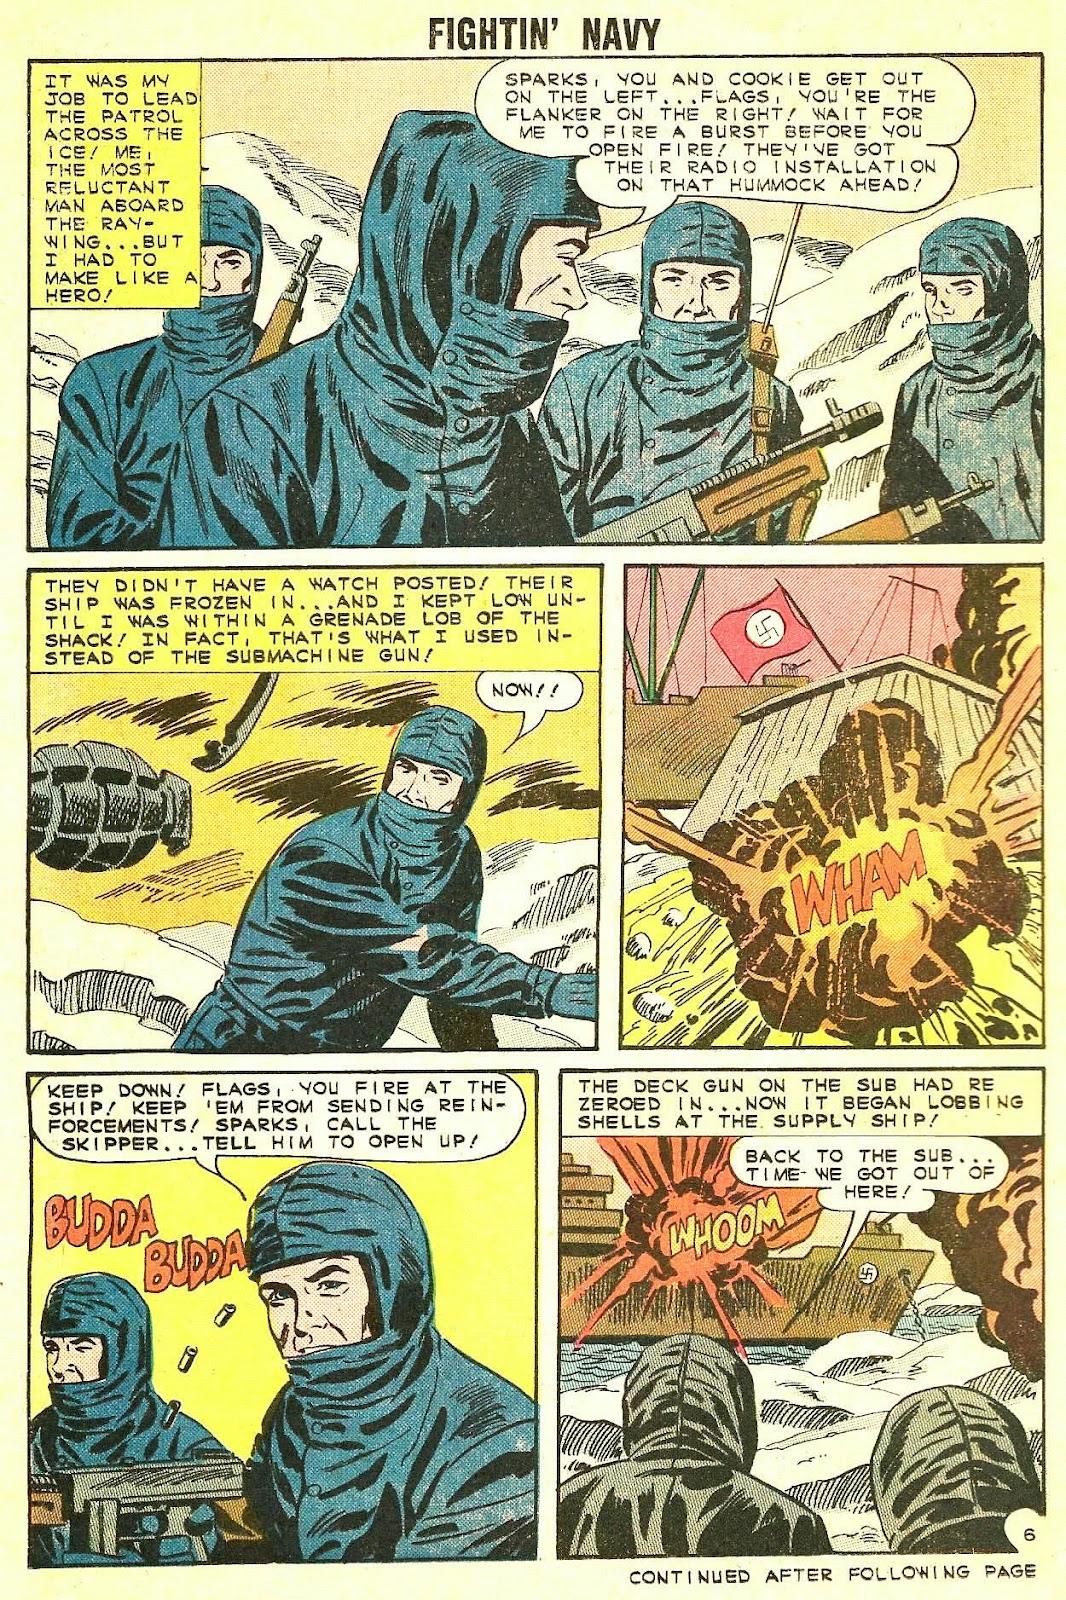 Read online Fightin' Navy comic -  Issue #115 - 14